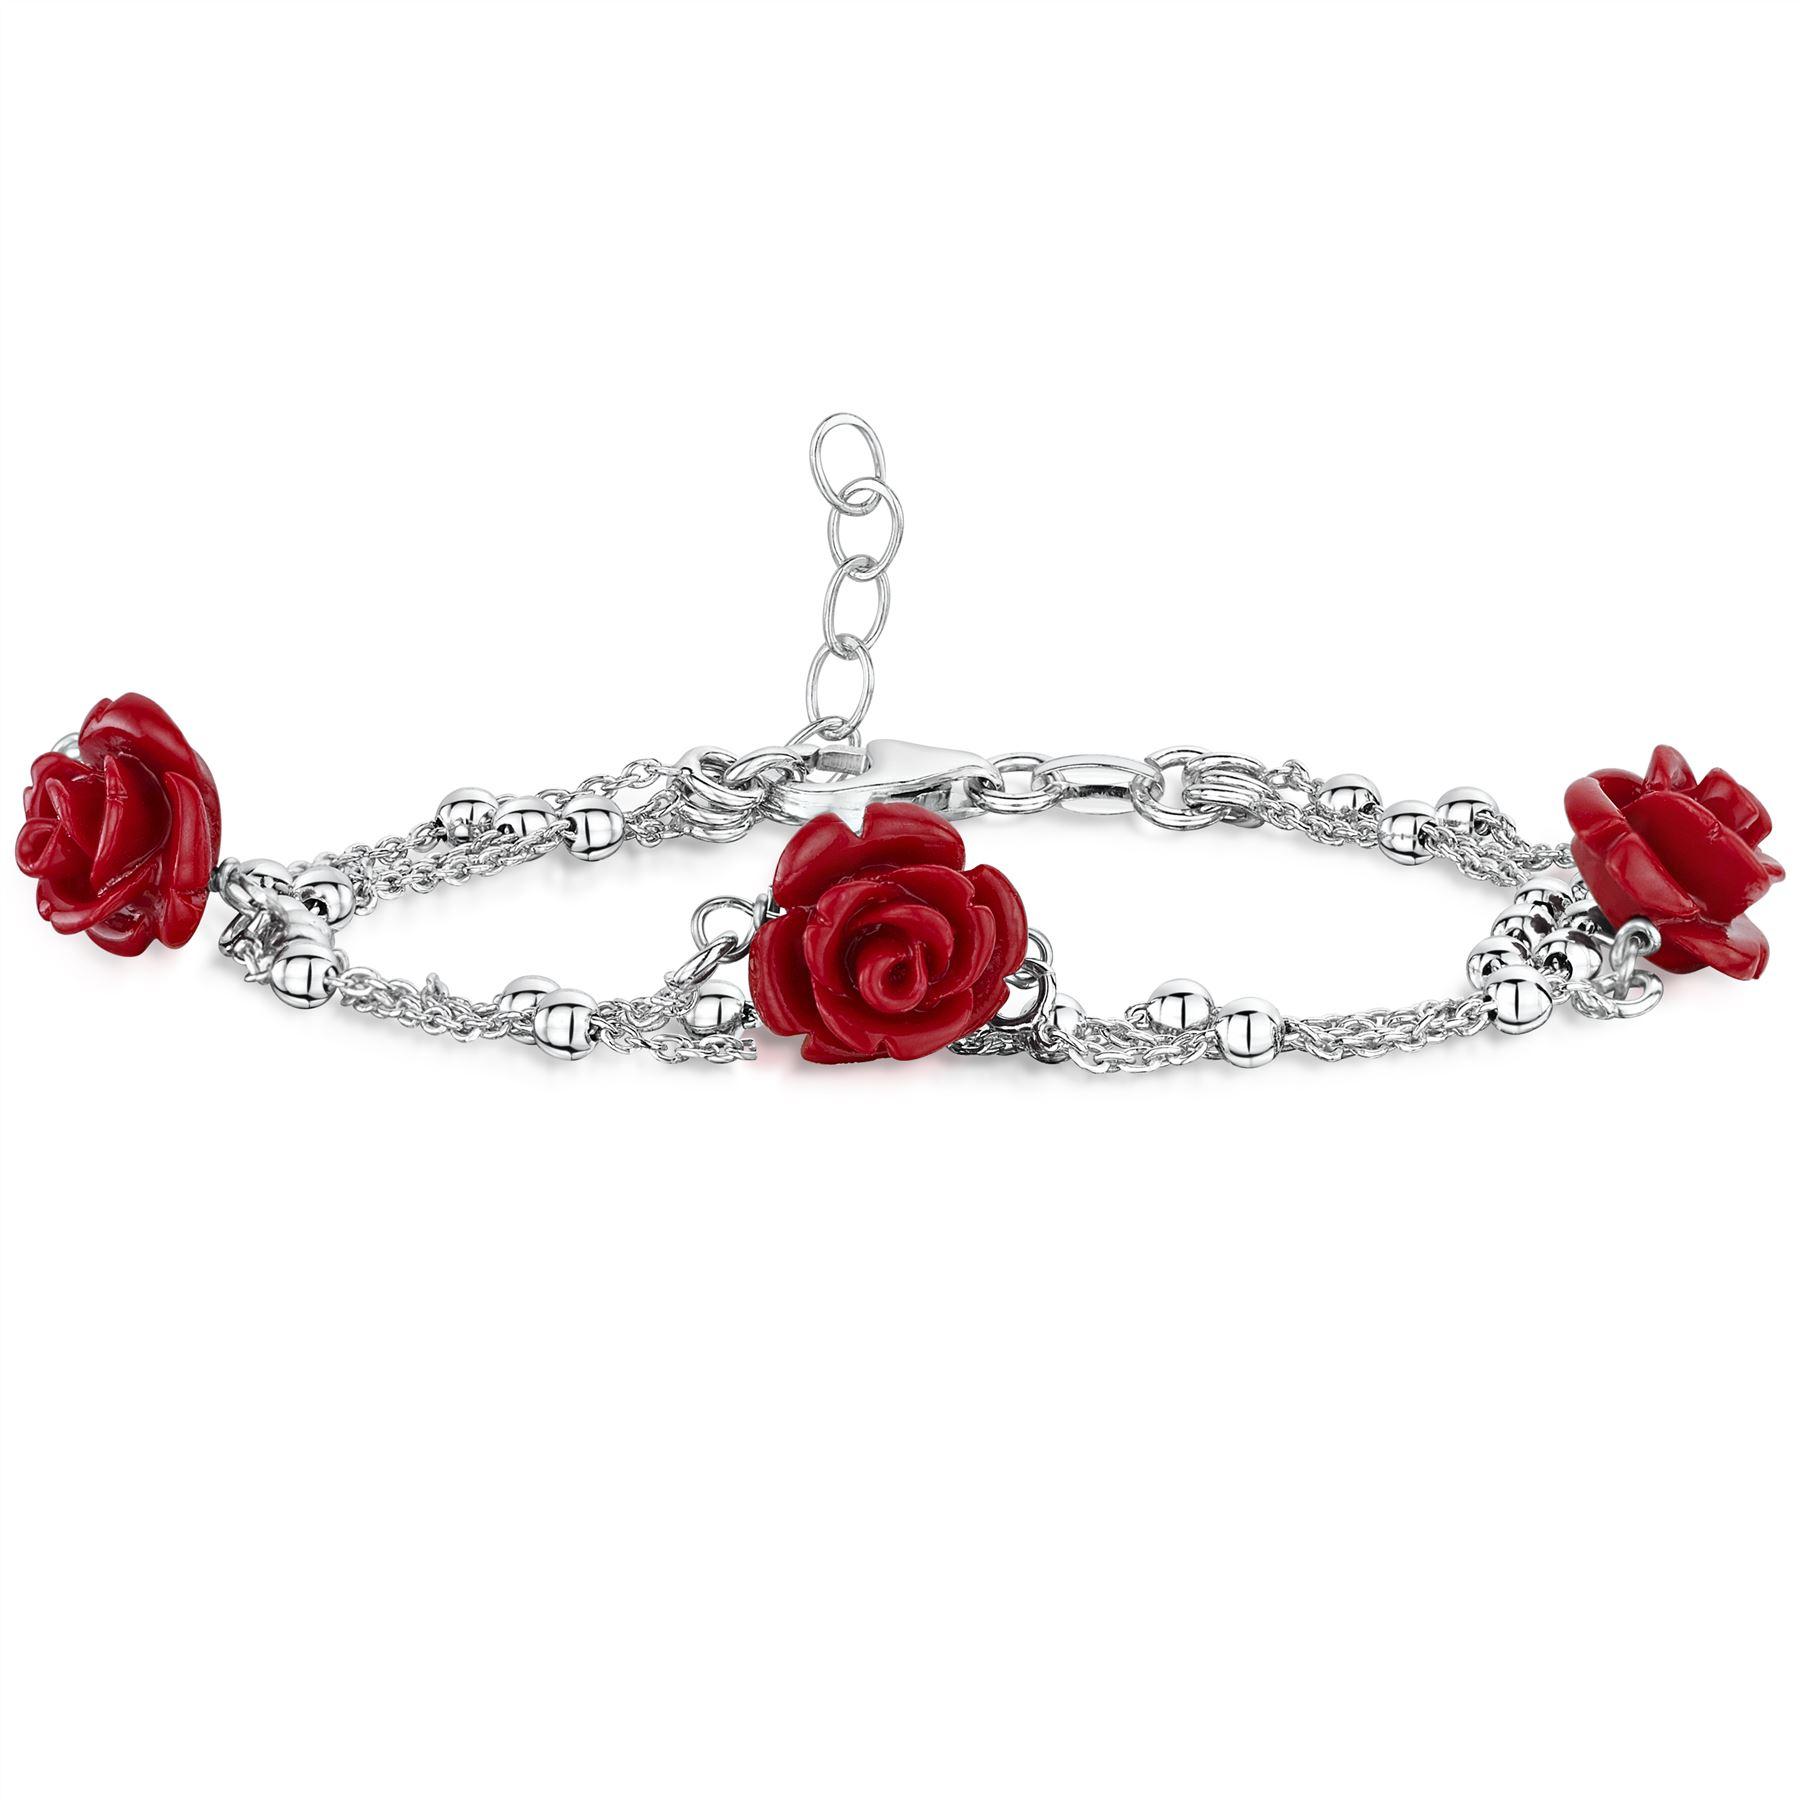 Amberta-Jewelry-925-Sterling-Silver-Adjustable-Bracelet-Italian-Bangle-for-Women thumbnail 24